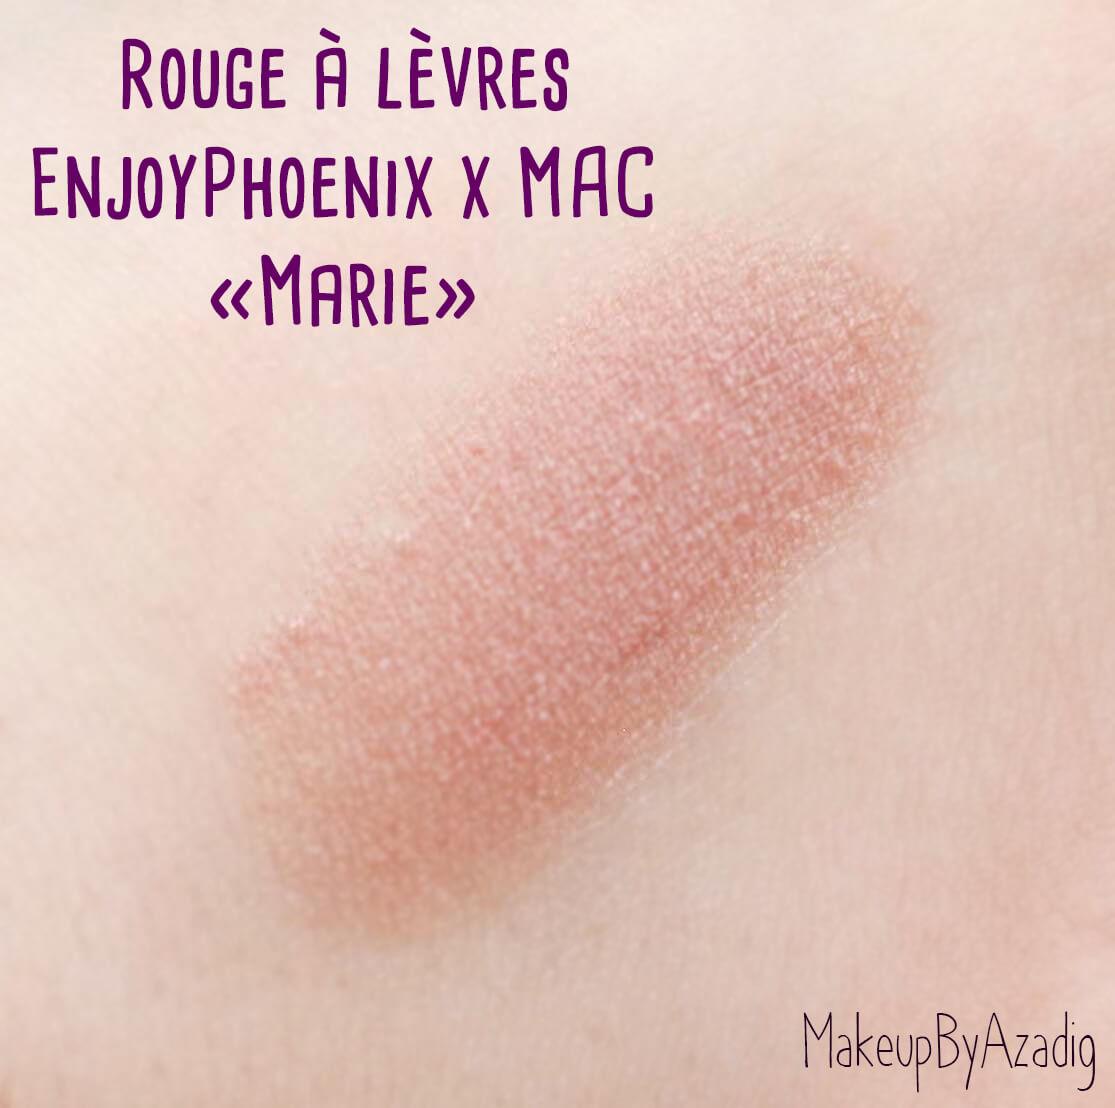 swatch-macxmarie-mac-cosmetics-rouge-a-levres-enjoy-phoenix-collaboration-makeupbyazadig-revue-avis-prix-meetup